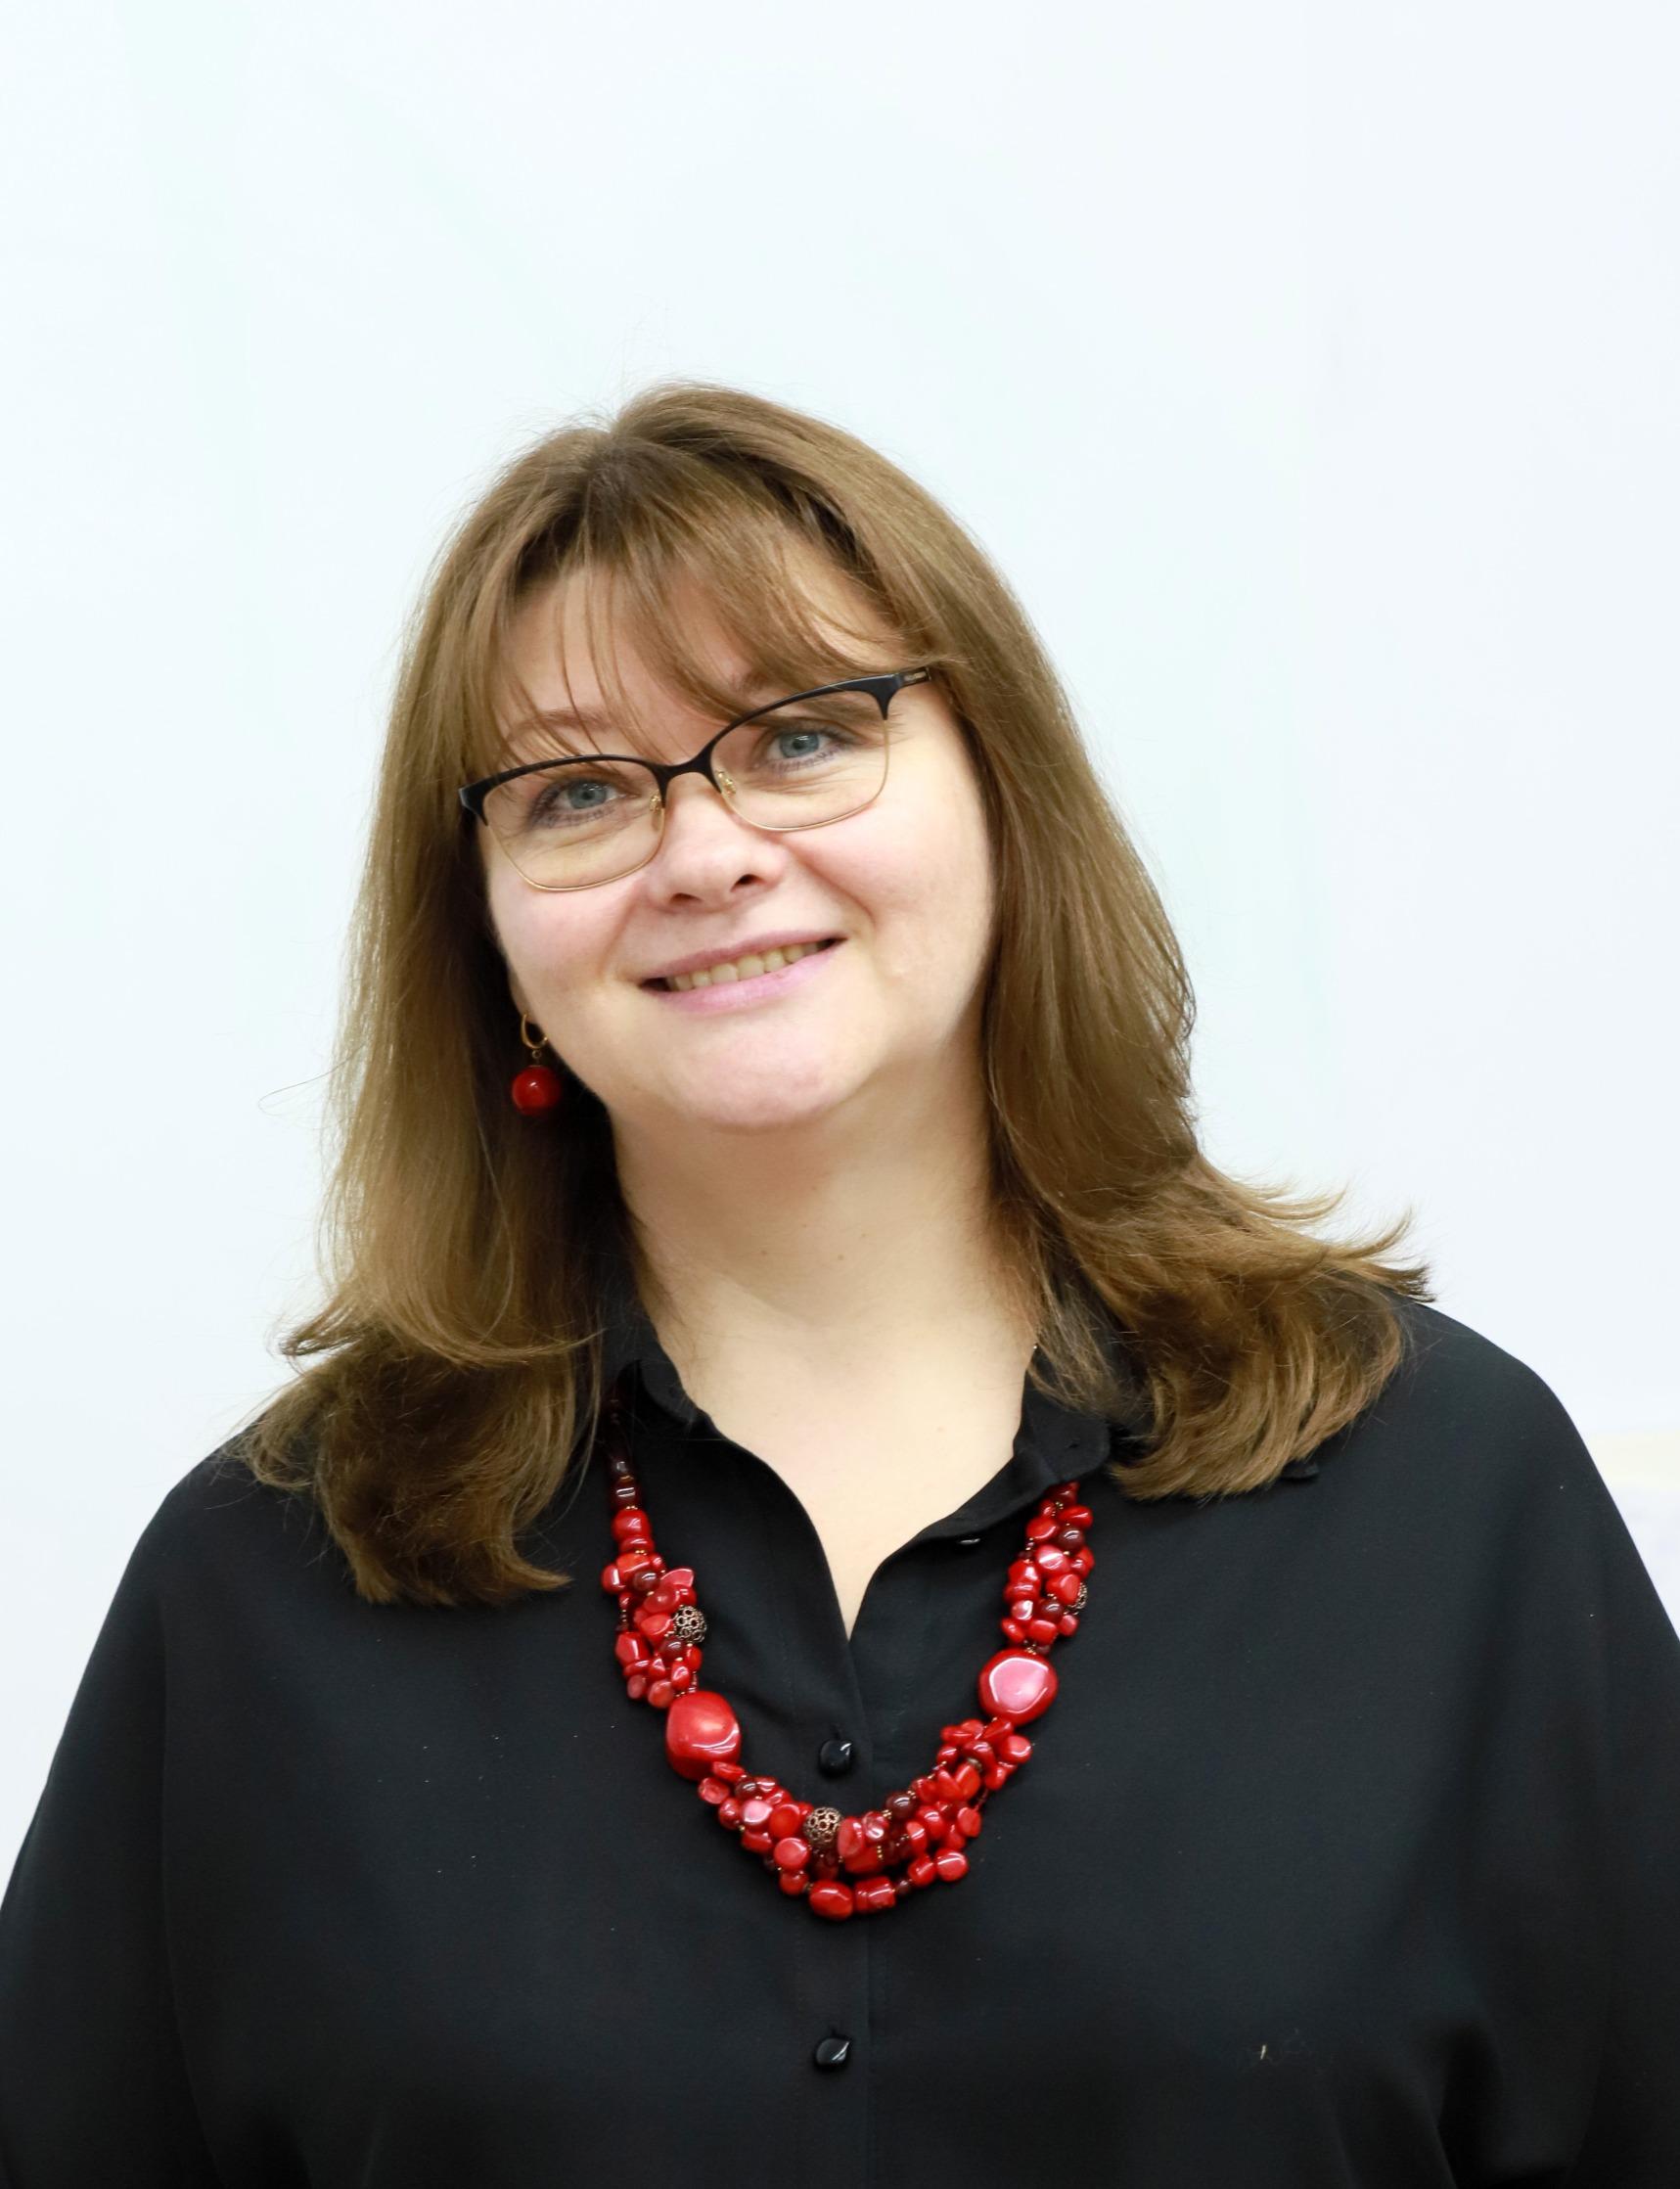 Михайлова Елена Валерьевна